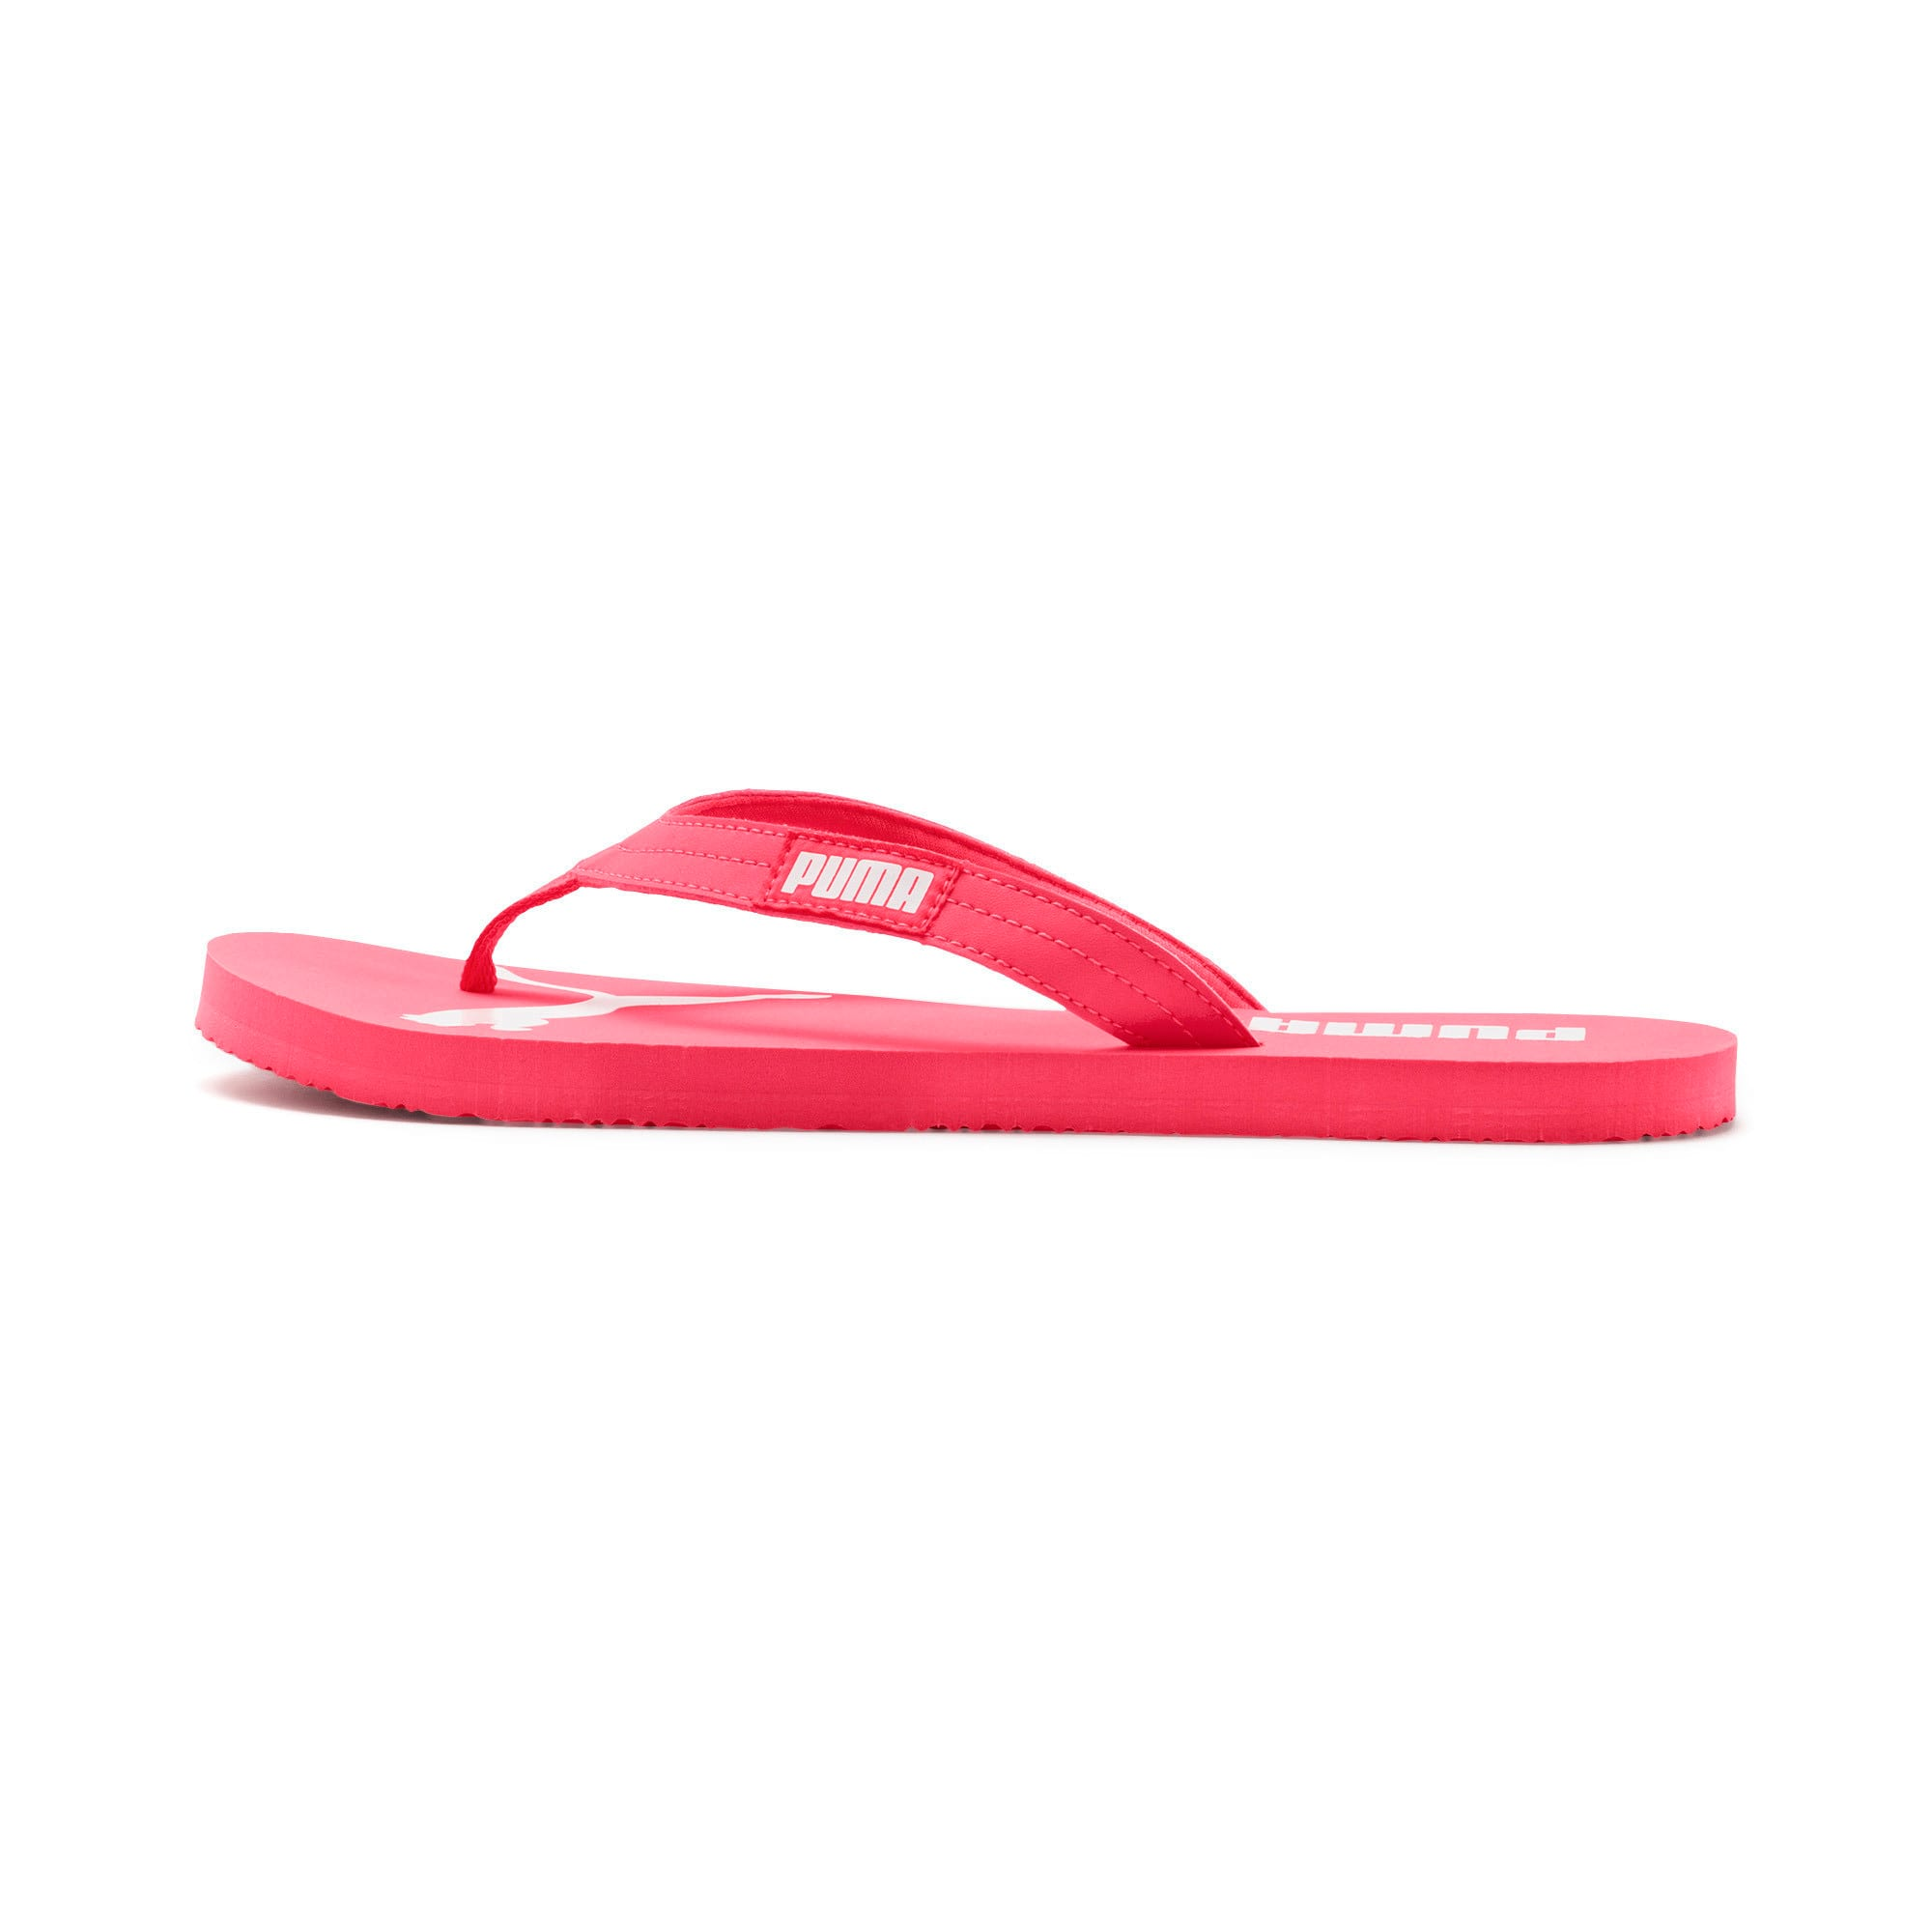 Thumbnail 1 of Cosy Flip Women's Sandals, Pink Alert-Puma White, medium